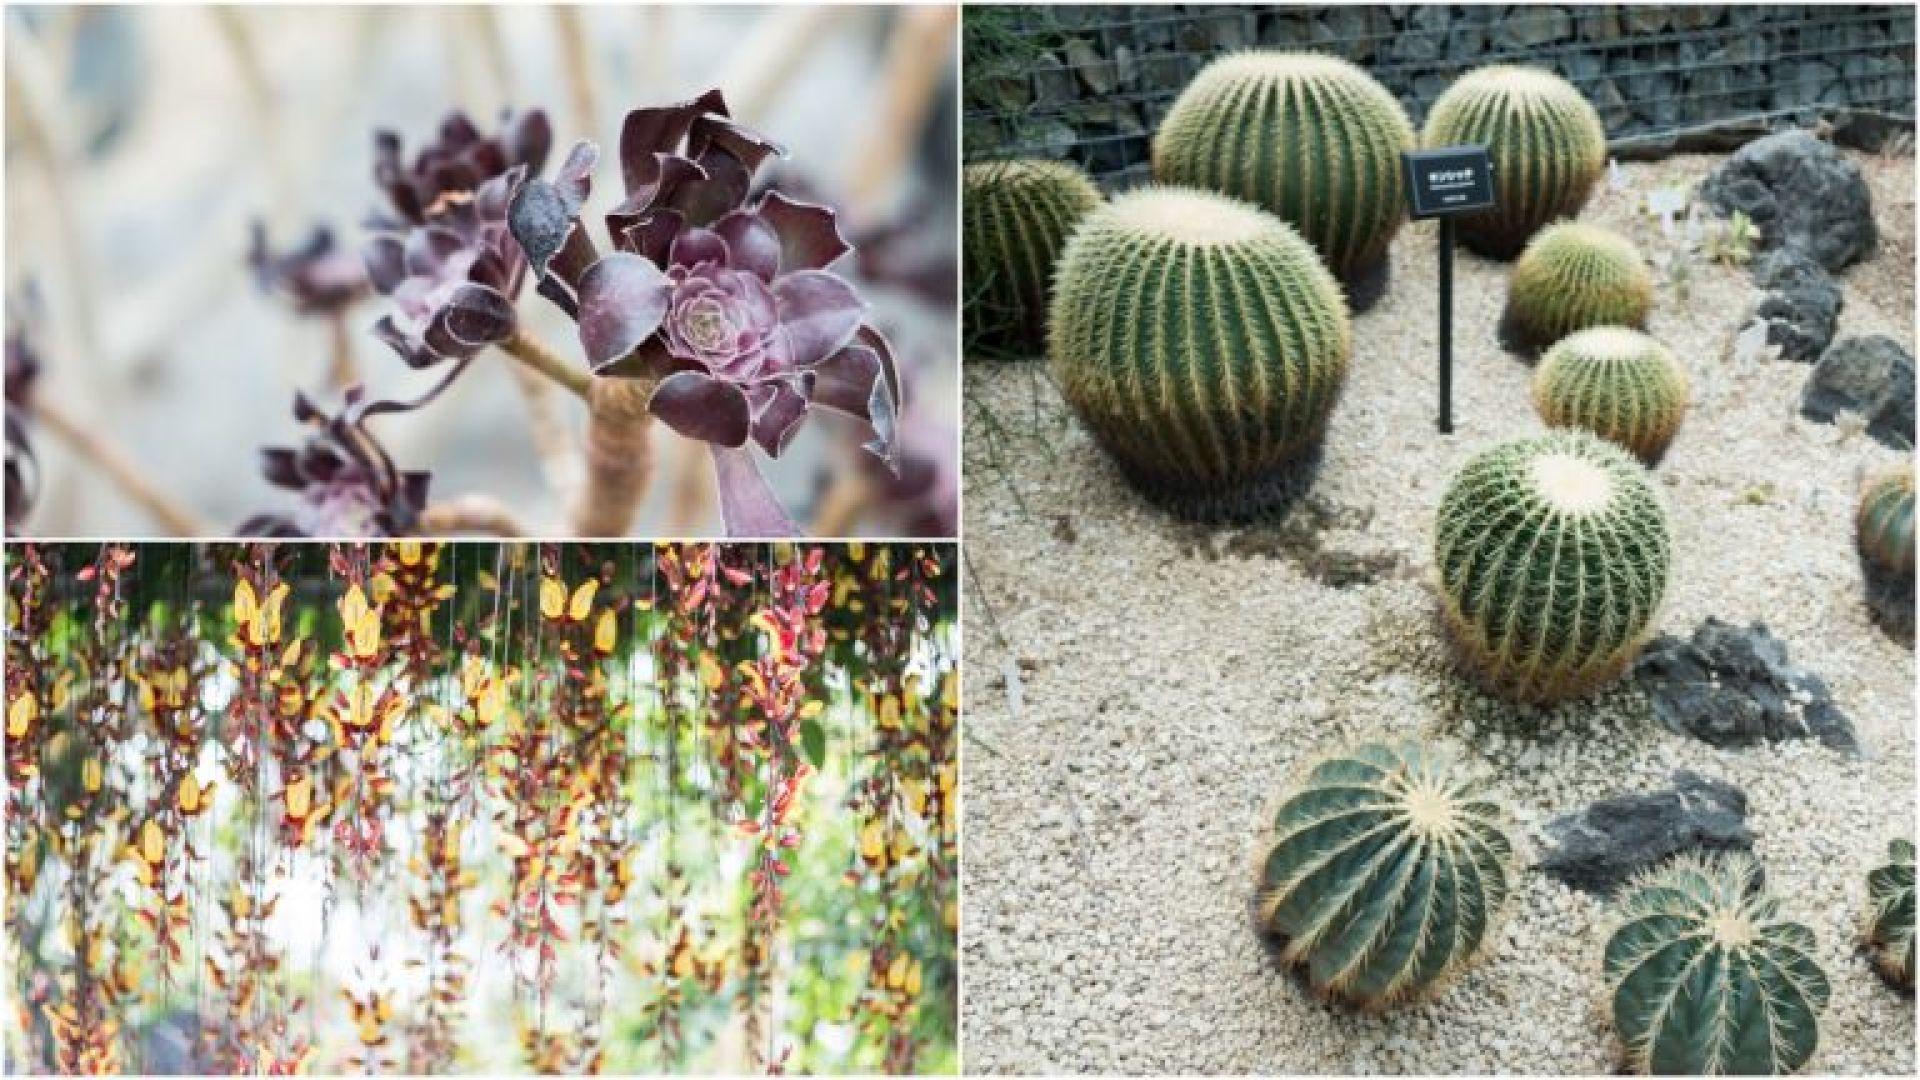 Plants in the Shinjuku greenhouse in Tokyo